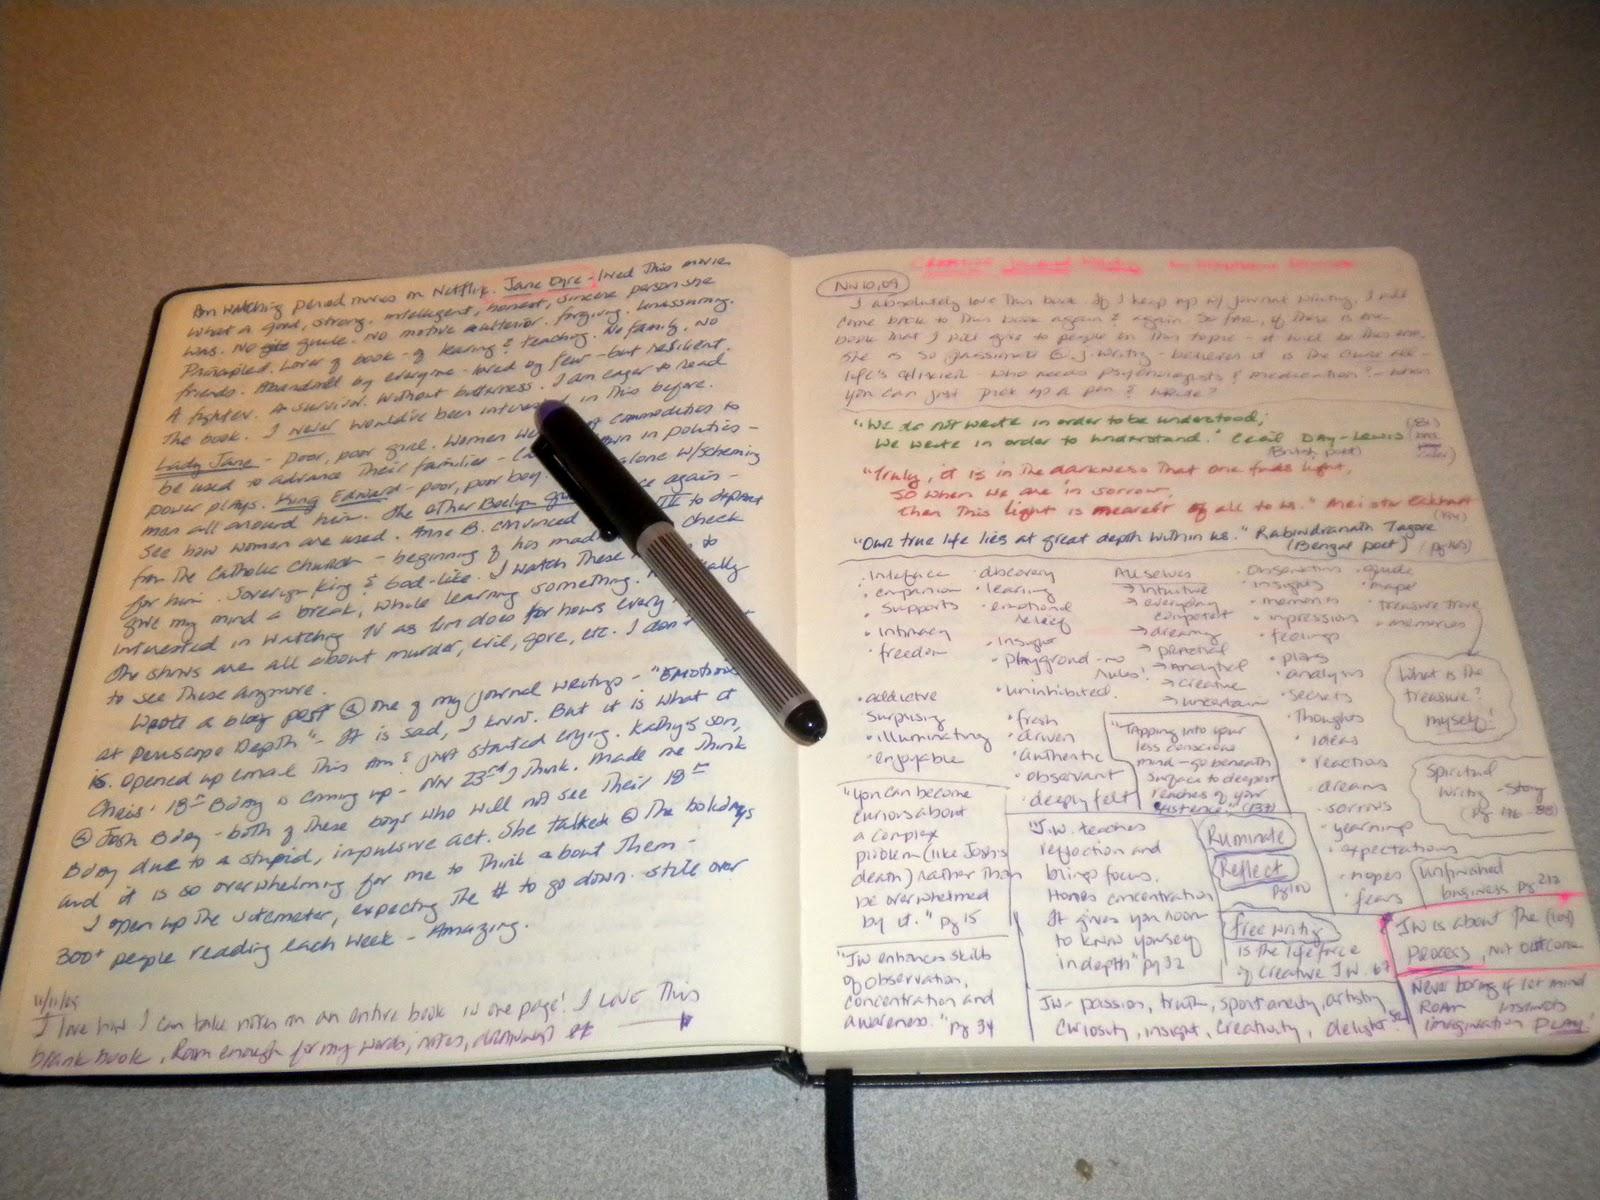 Remembering Josh: My Journal, My Friend